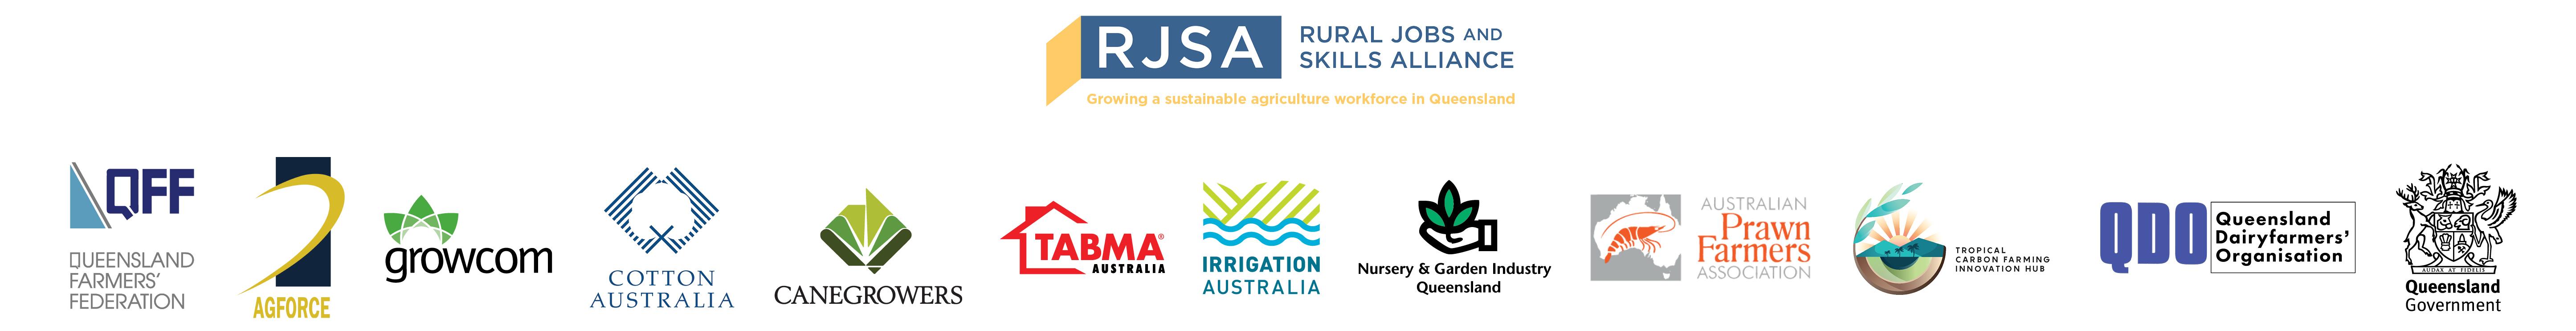 RJSA logo banner